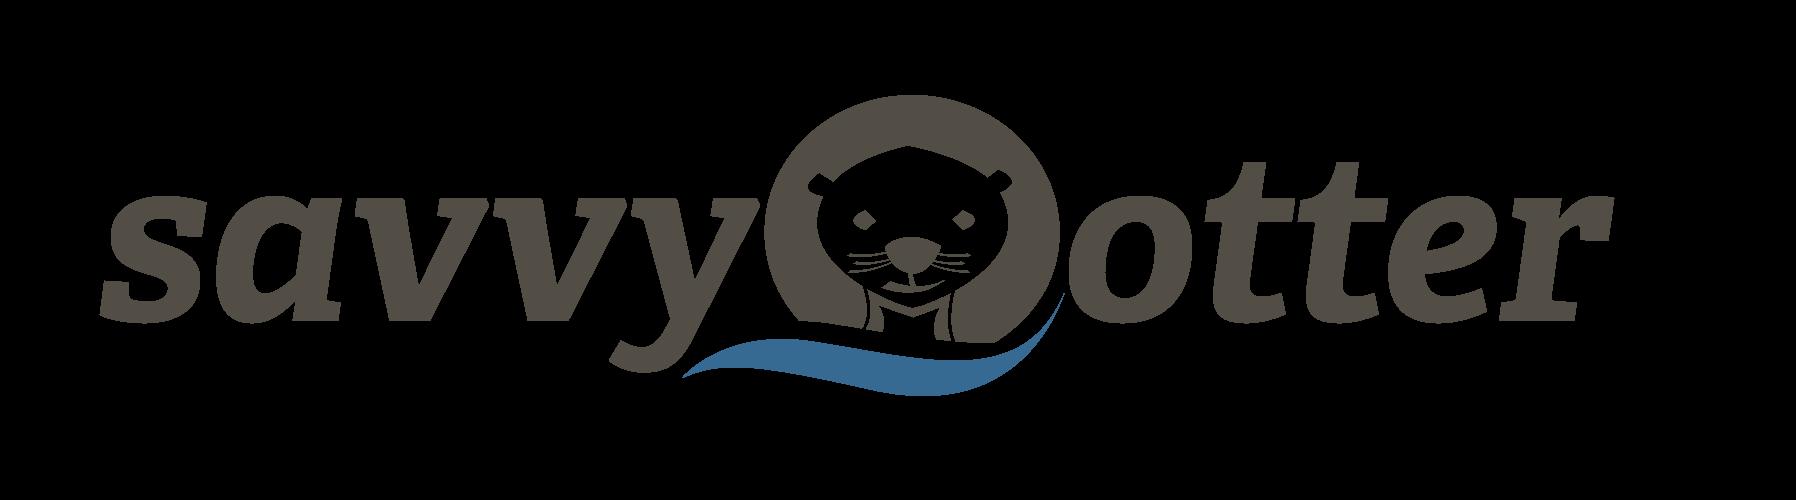 Savvy Otter